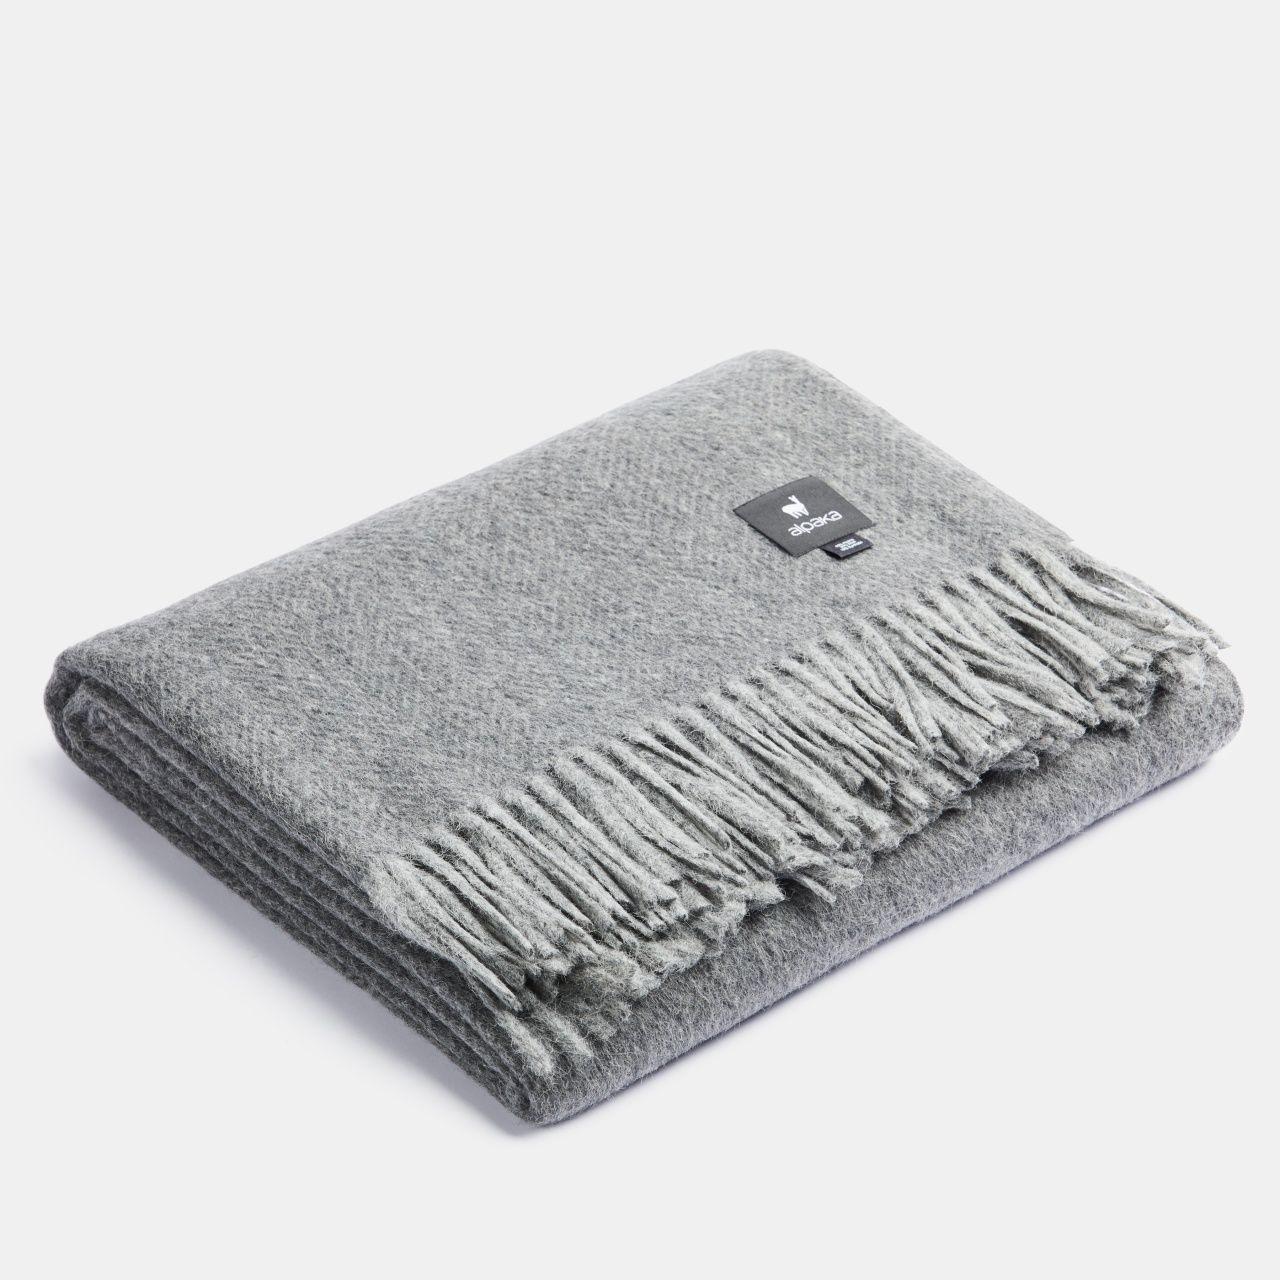 ALPAKA - Classic Fishbone - Alpaca-woolen Plaid – Charcoal/Grey – 150x200